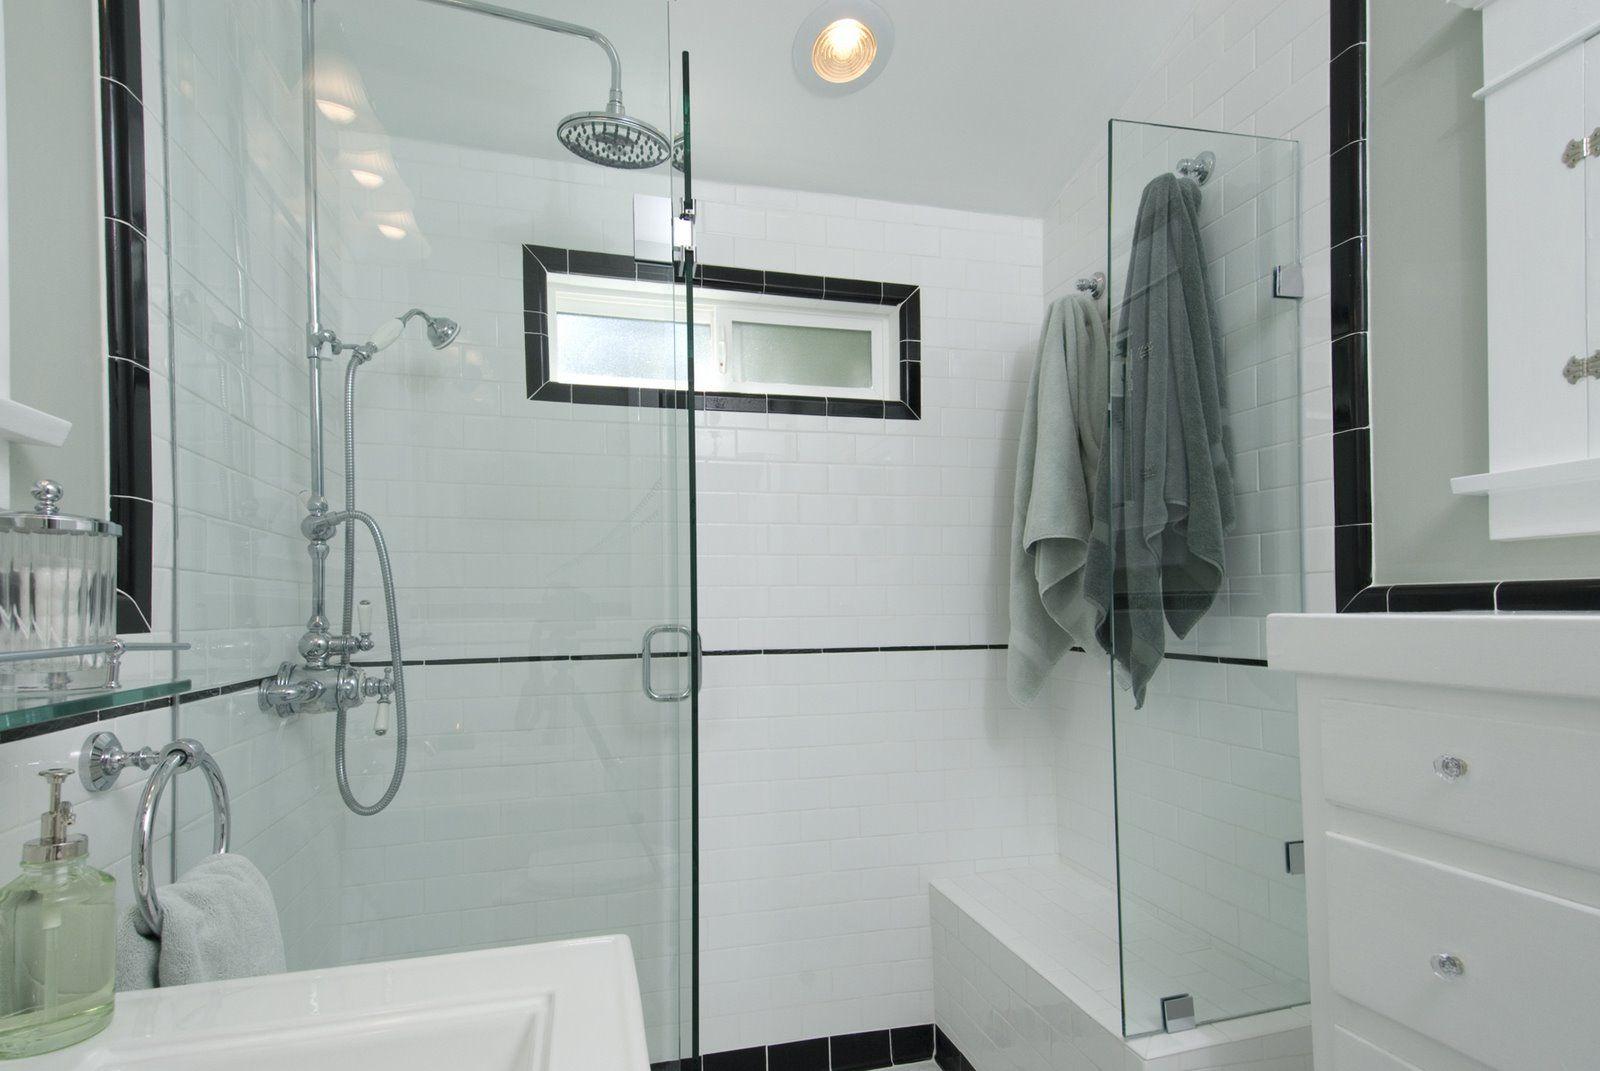 Towel racks at end of shower | A2. Bathroom Ideas | Pinterest | Towels